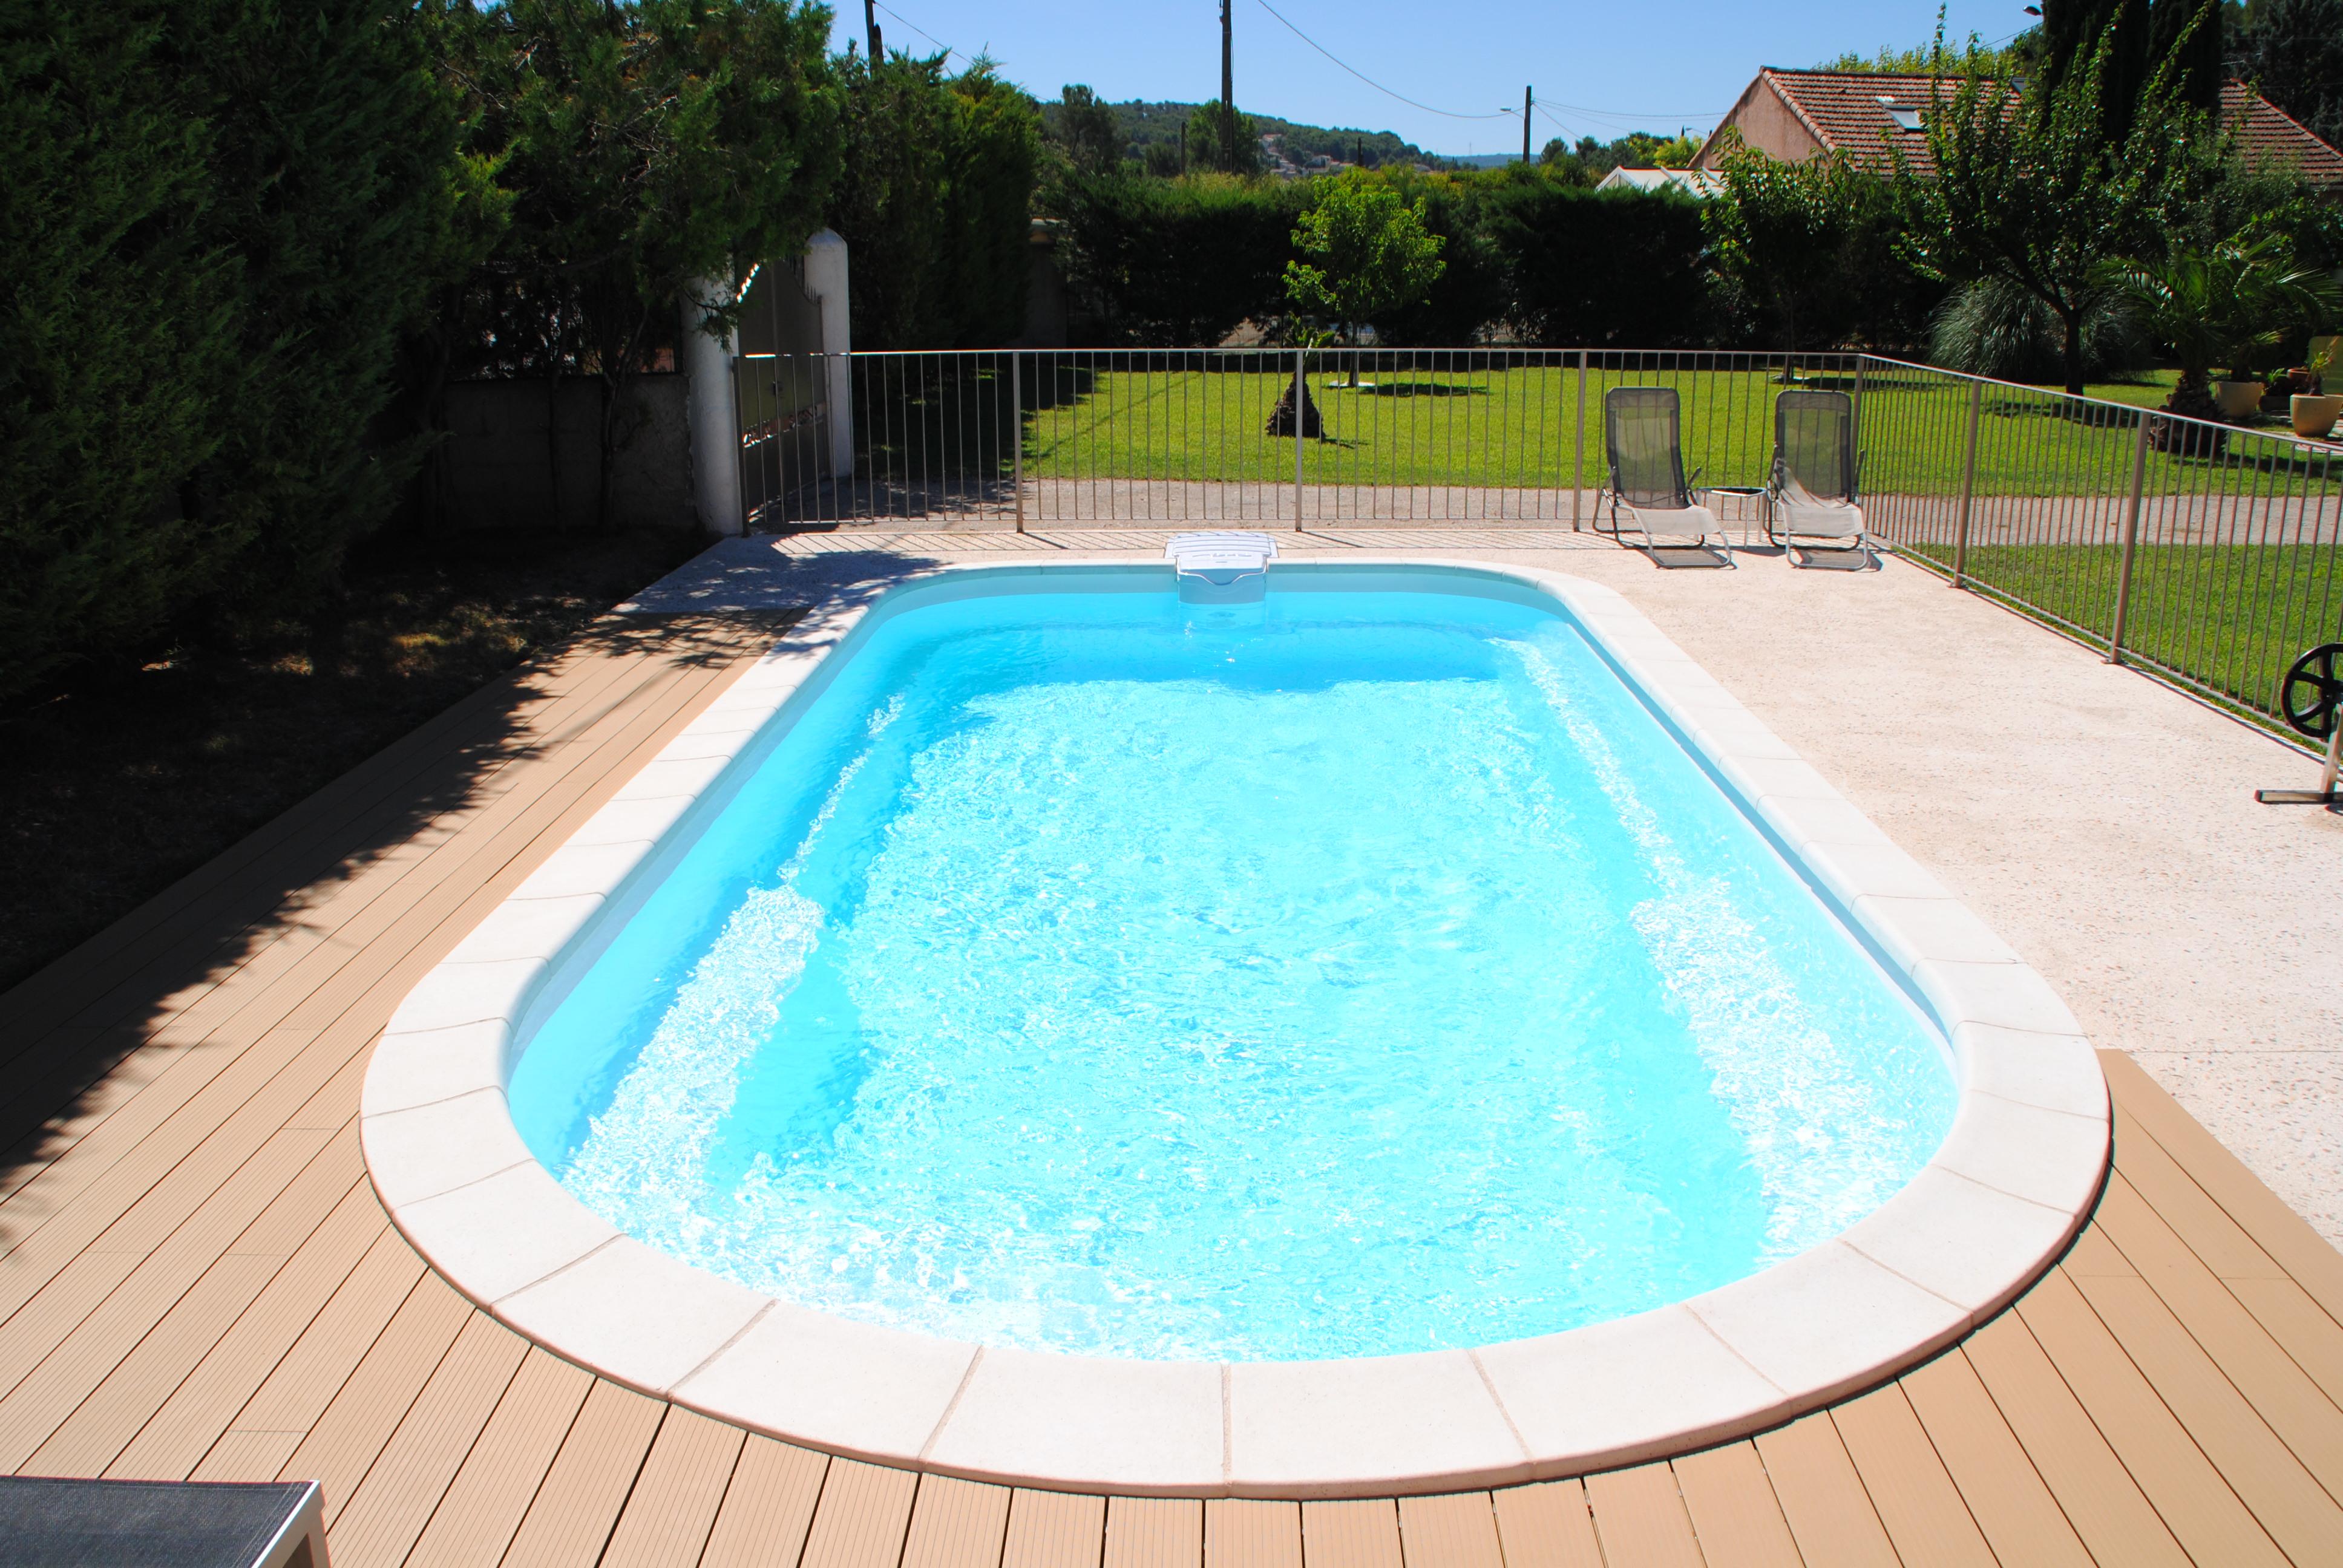 Coque polyester axeo 800 avec bloc filtrant nos piscines for Bloc filtrant piscine